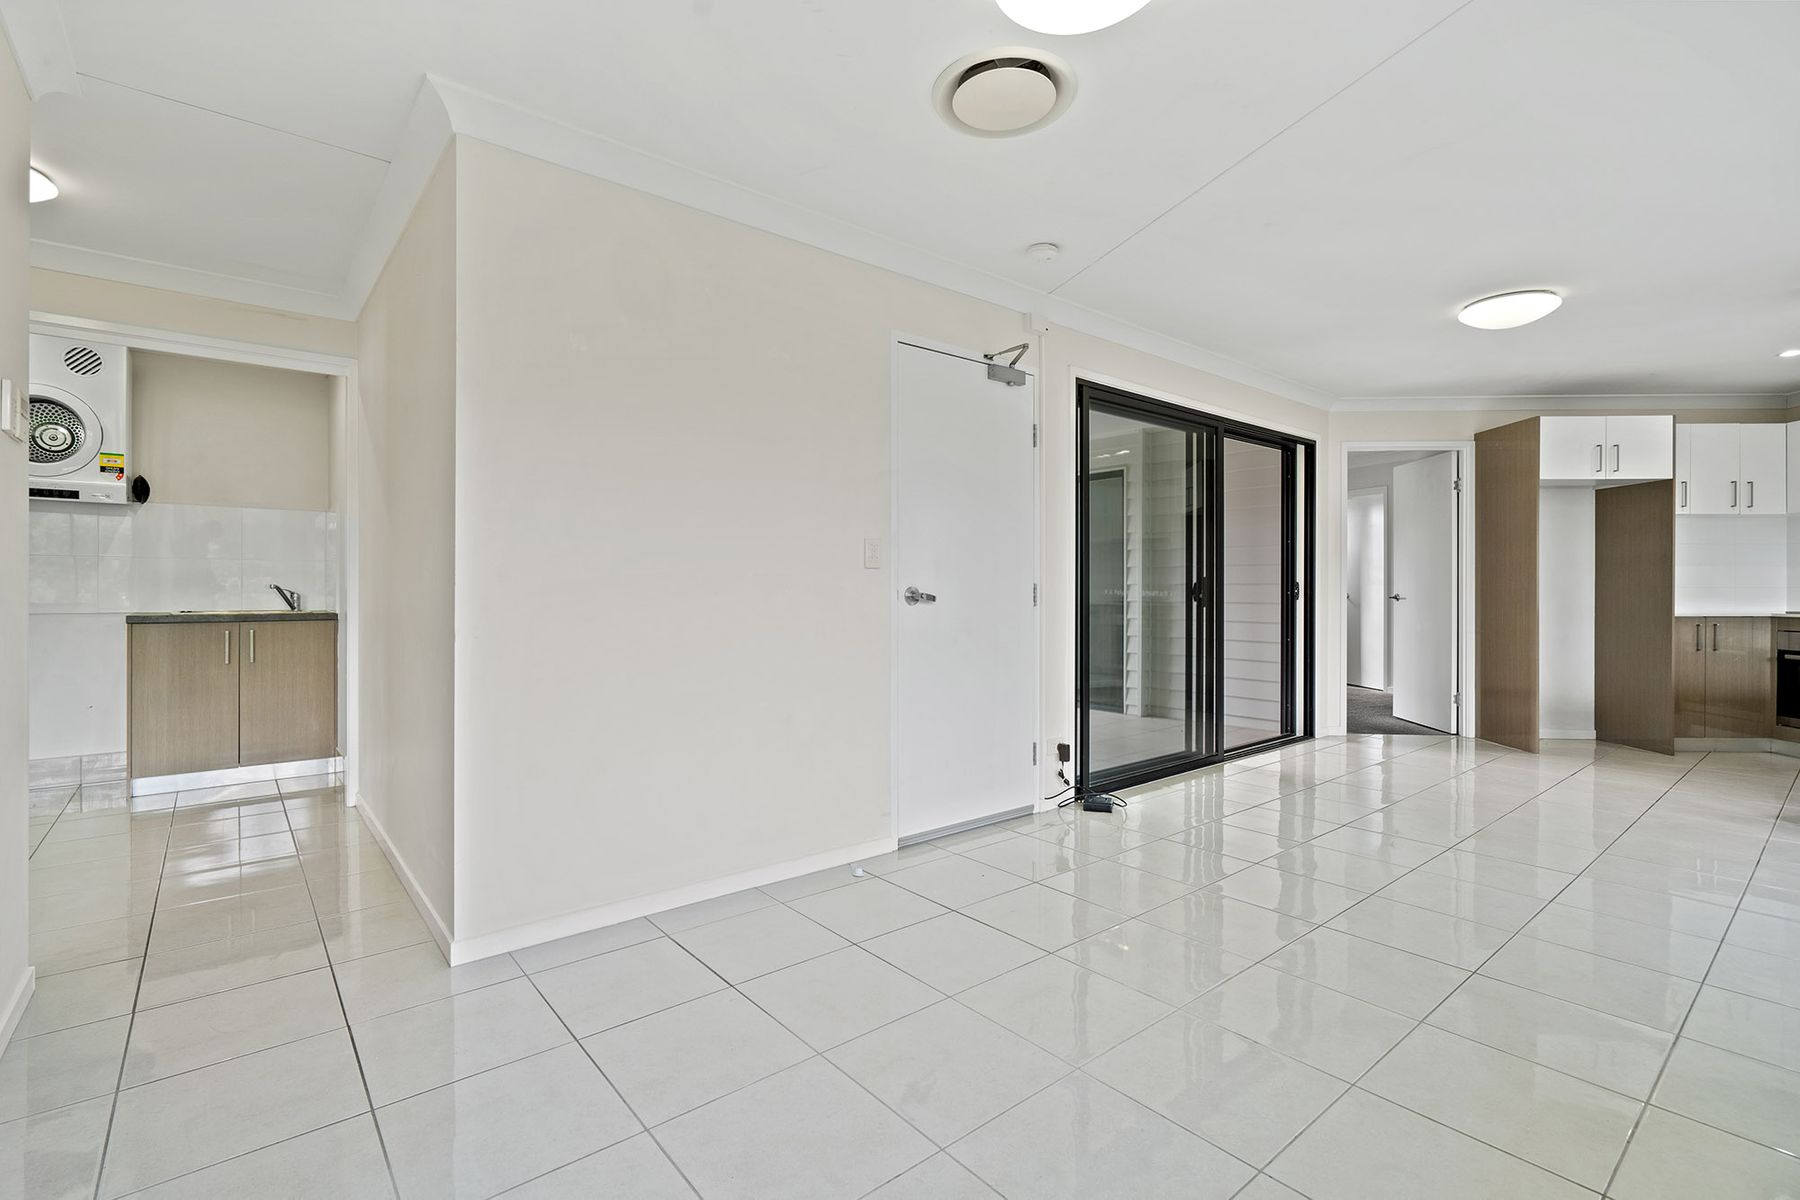 5/52 Hooker Street, Windsor, QLD 4030